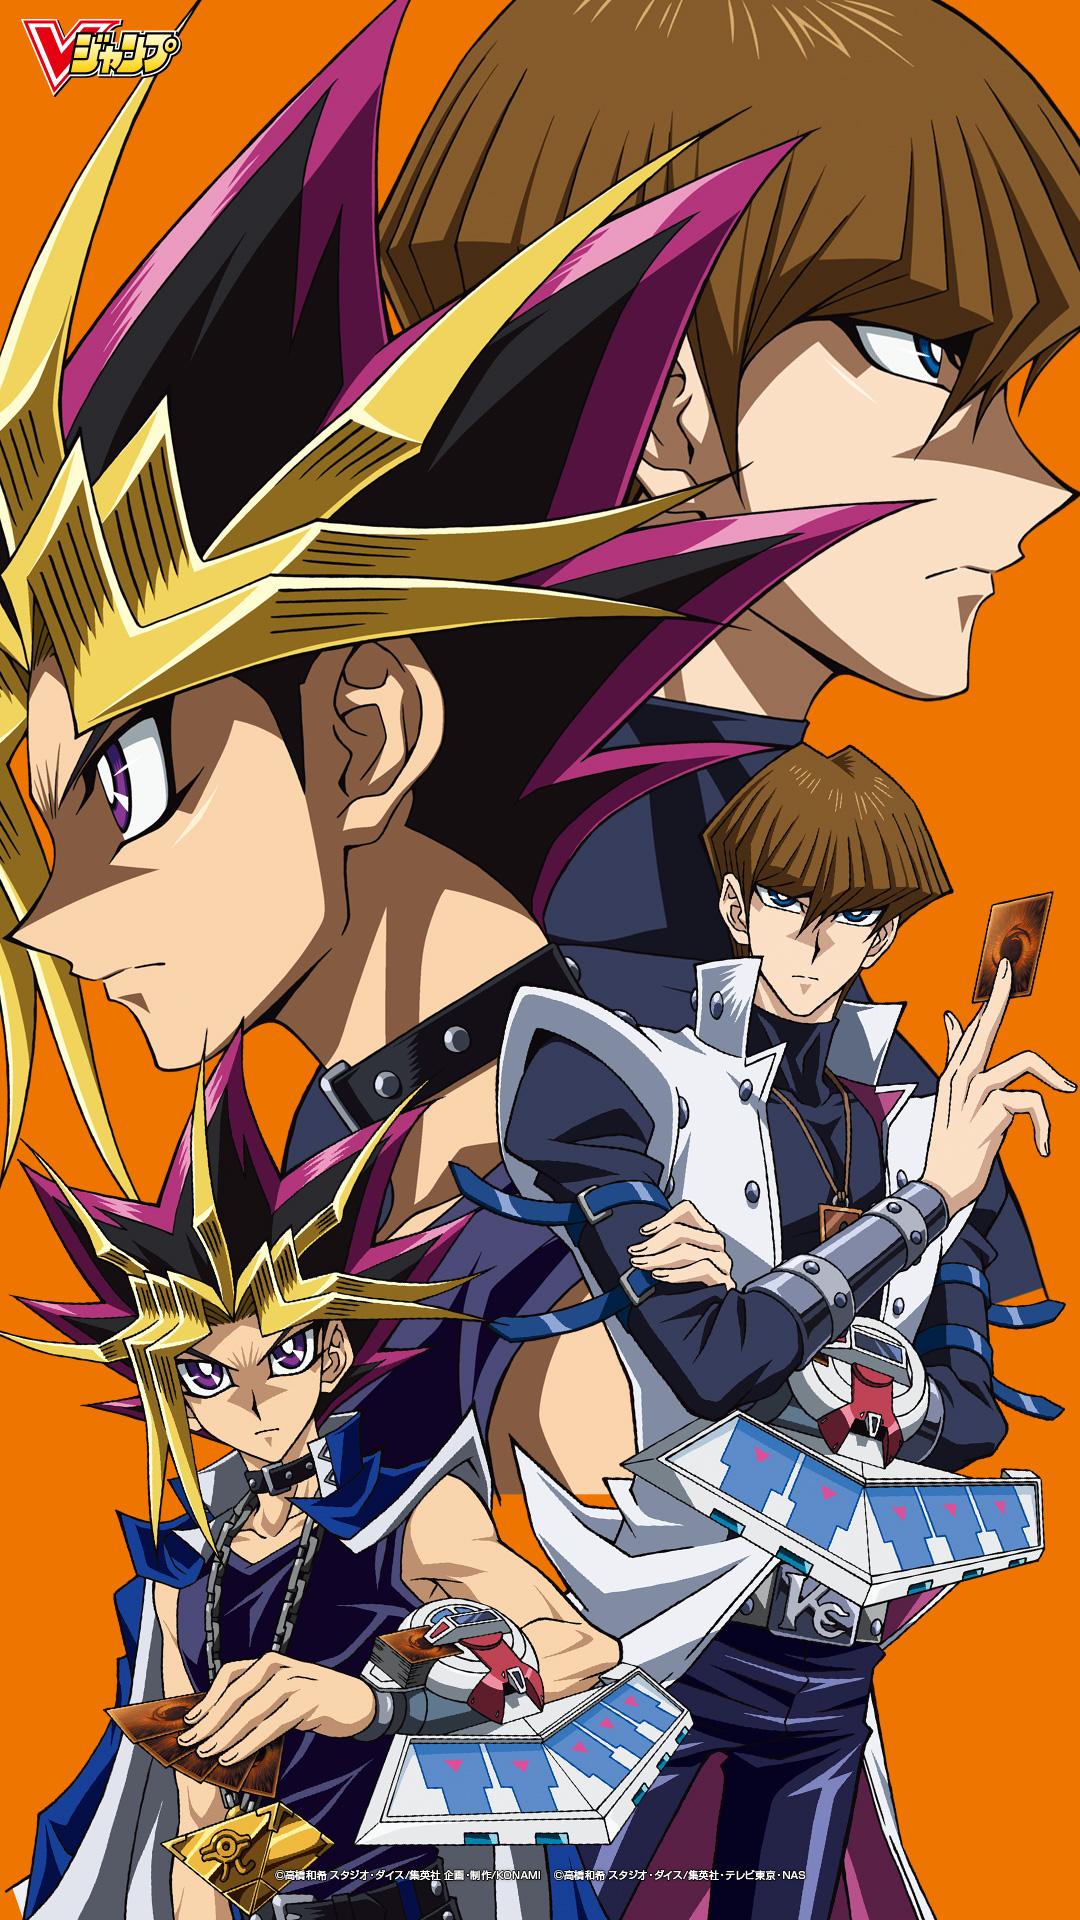 Yu Gi Oh Duel Monsters Mobile Wallpaper 2340904 Zerochan Anime